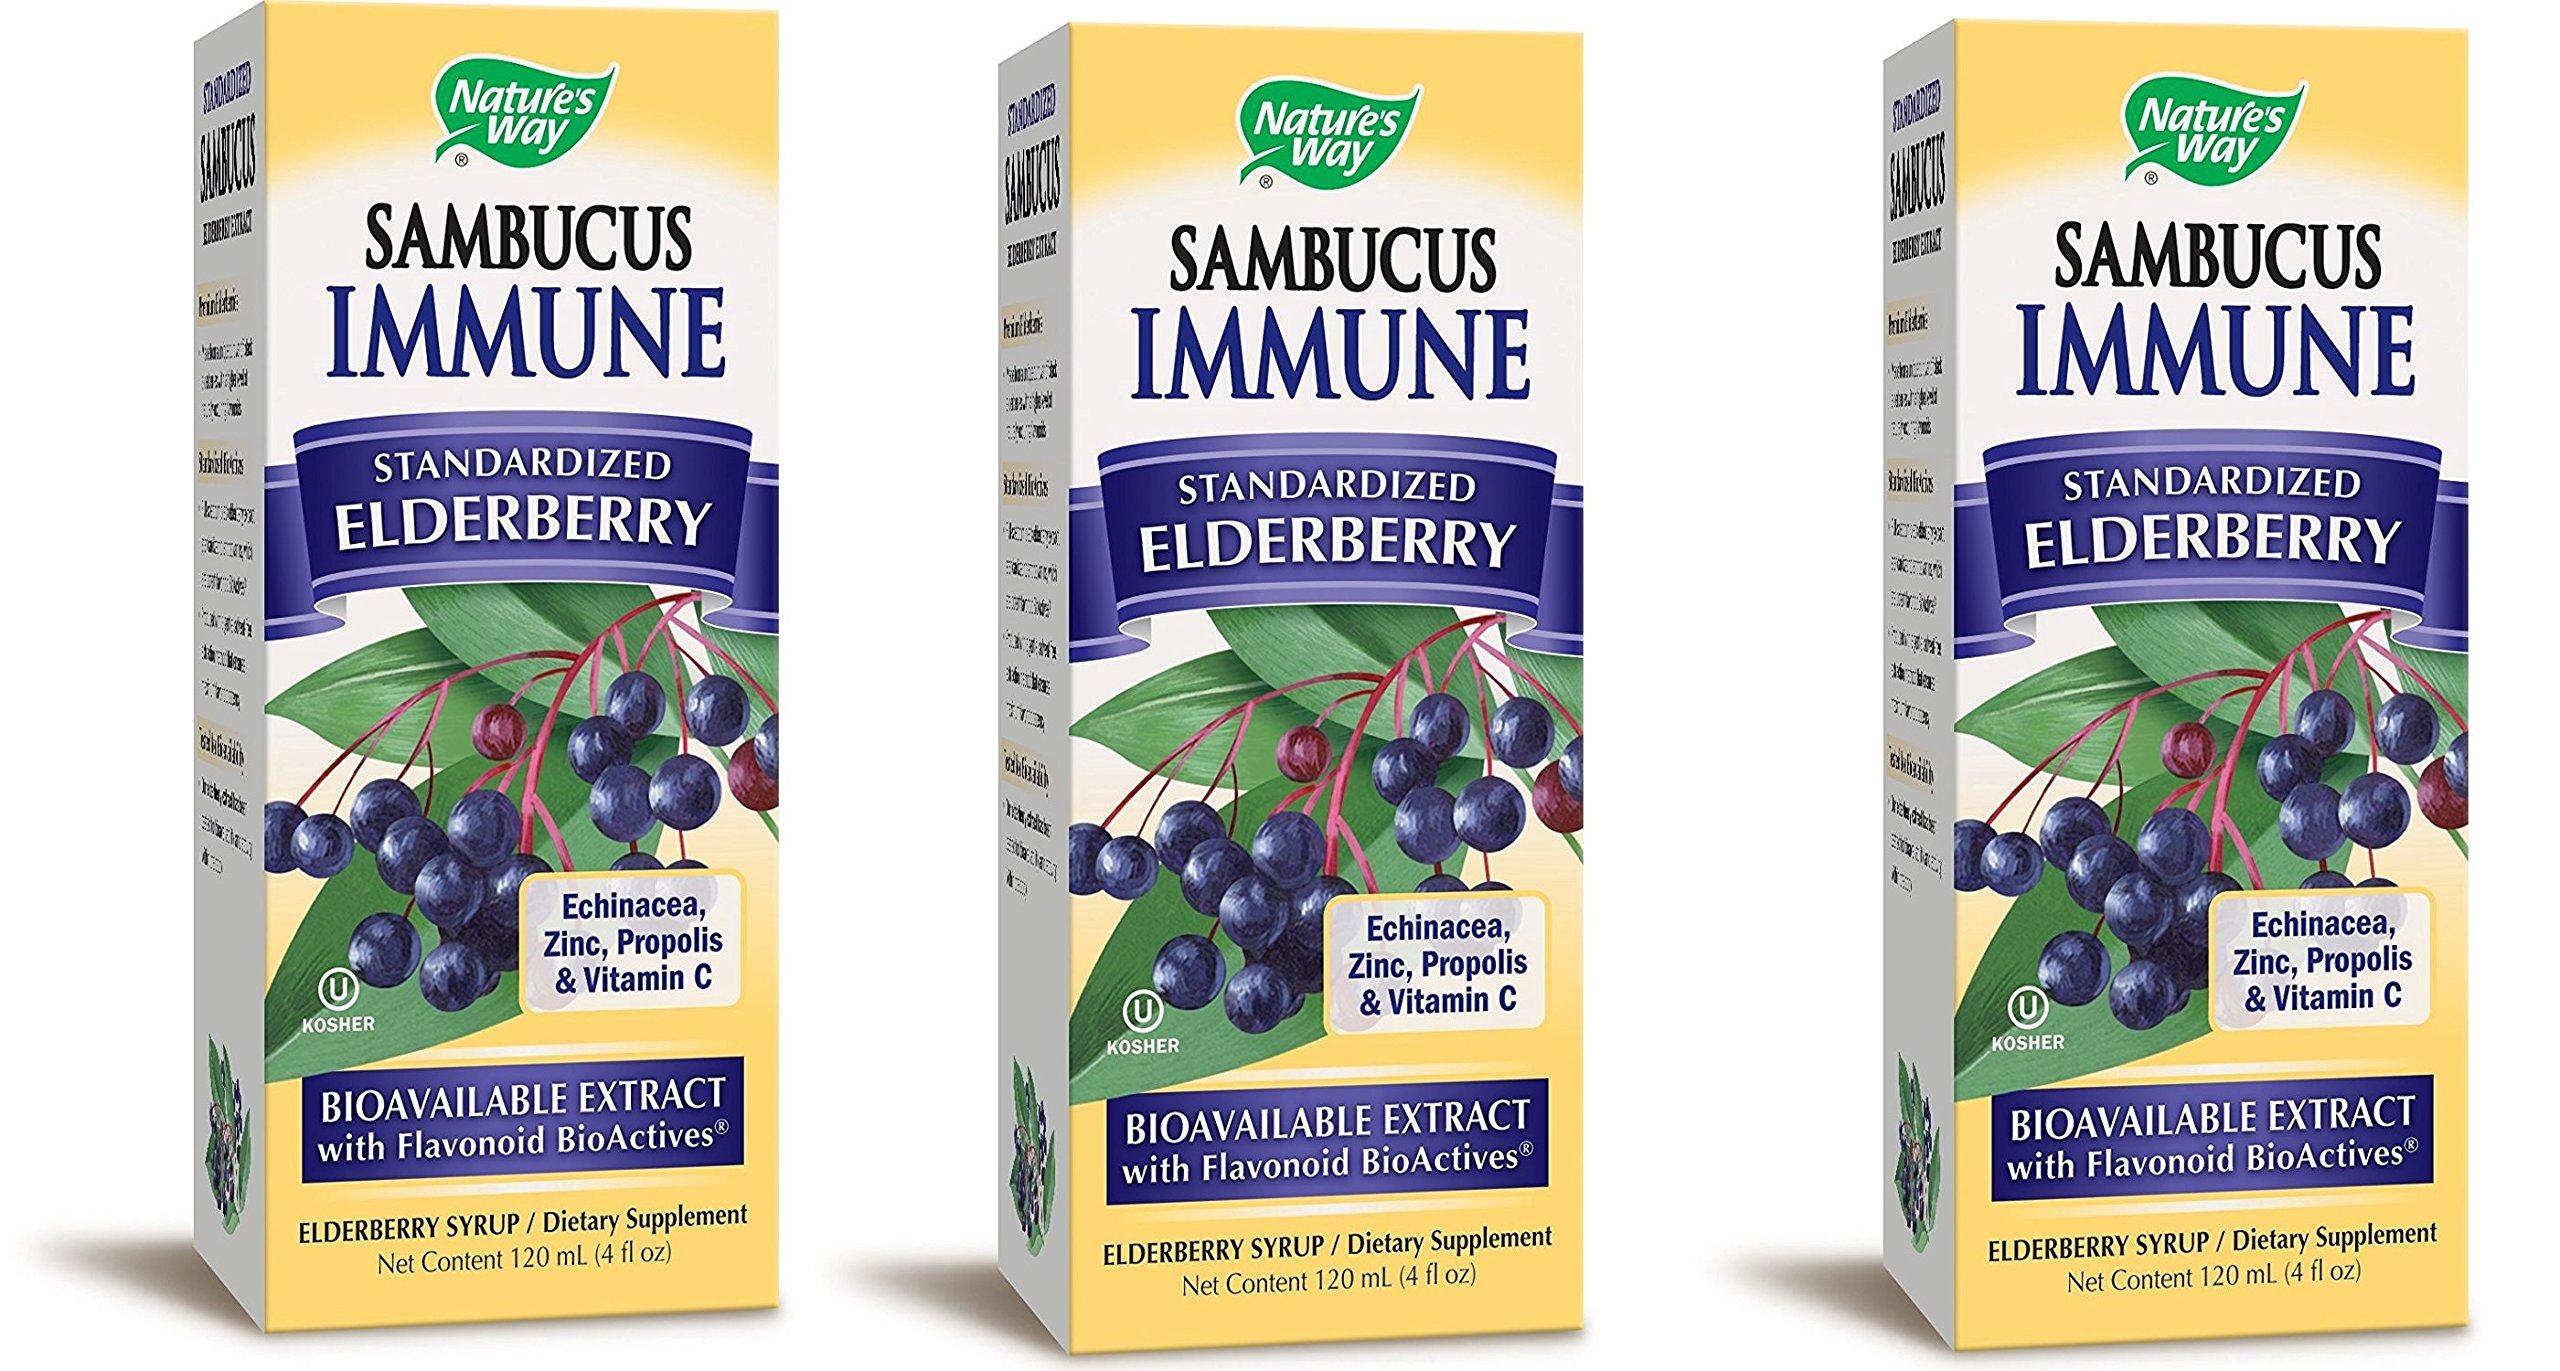 Natures Way Sambucus Black Elderberry Immune Syrup, 4 Ounce - 3 per case.